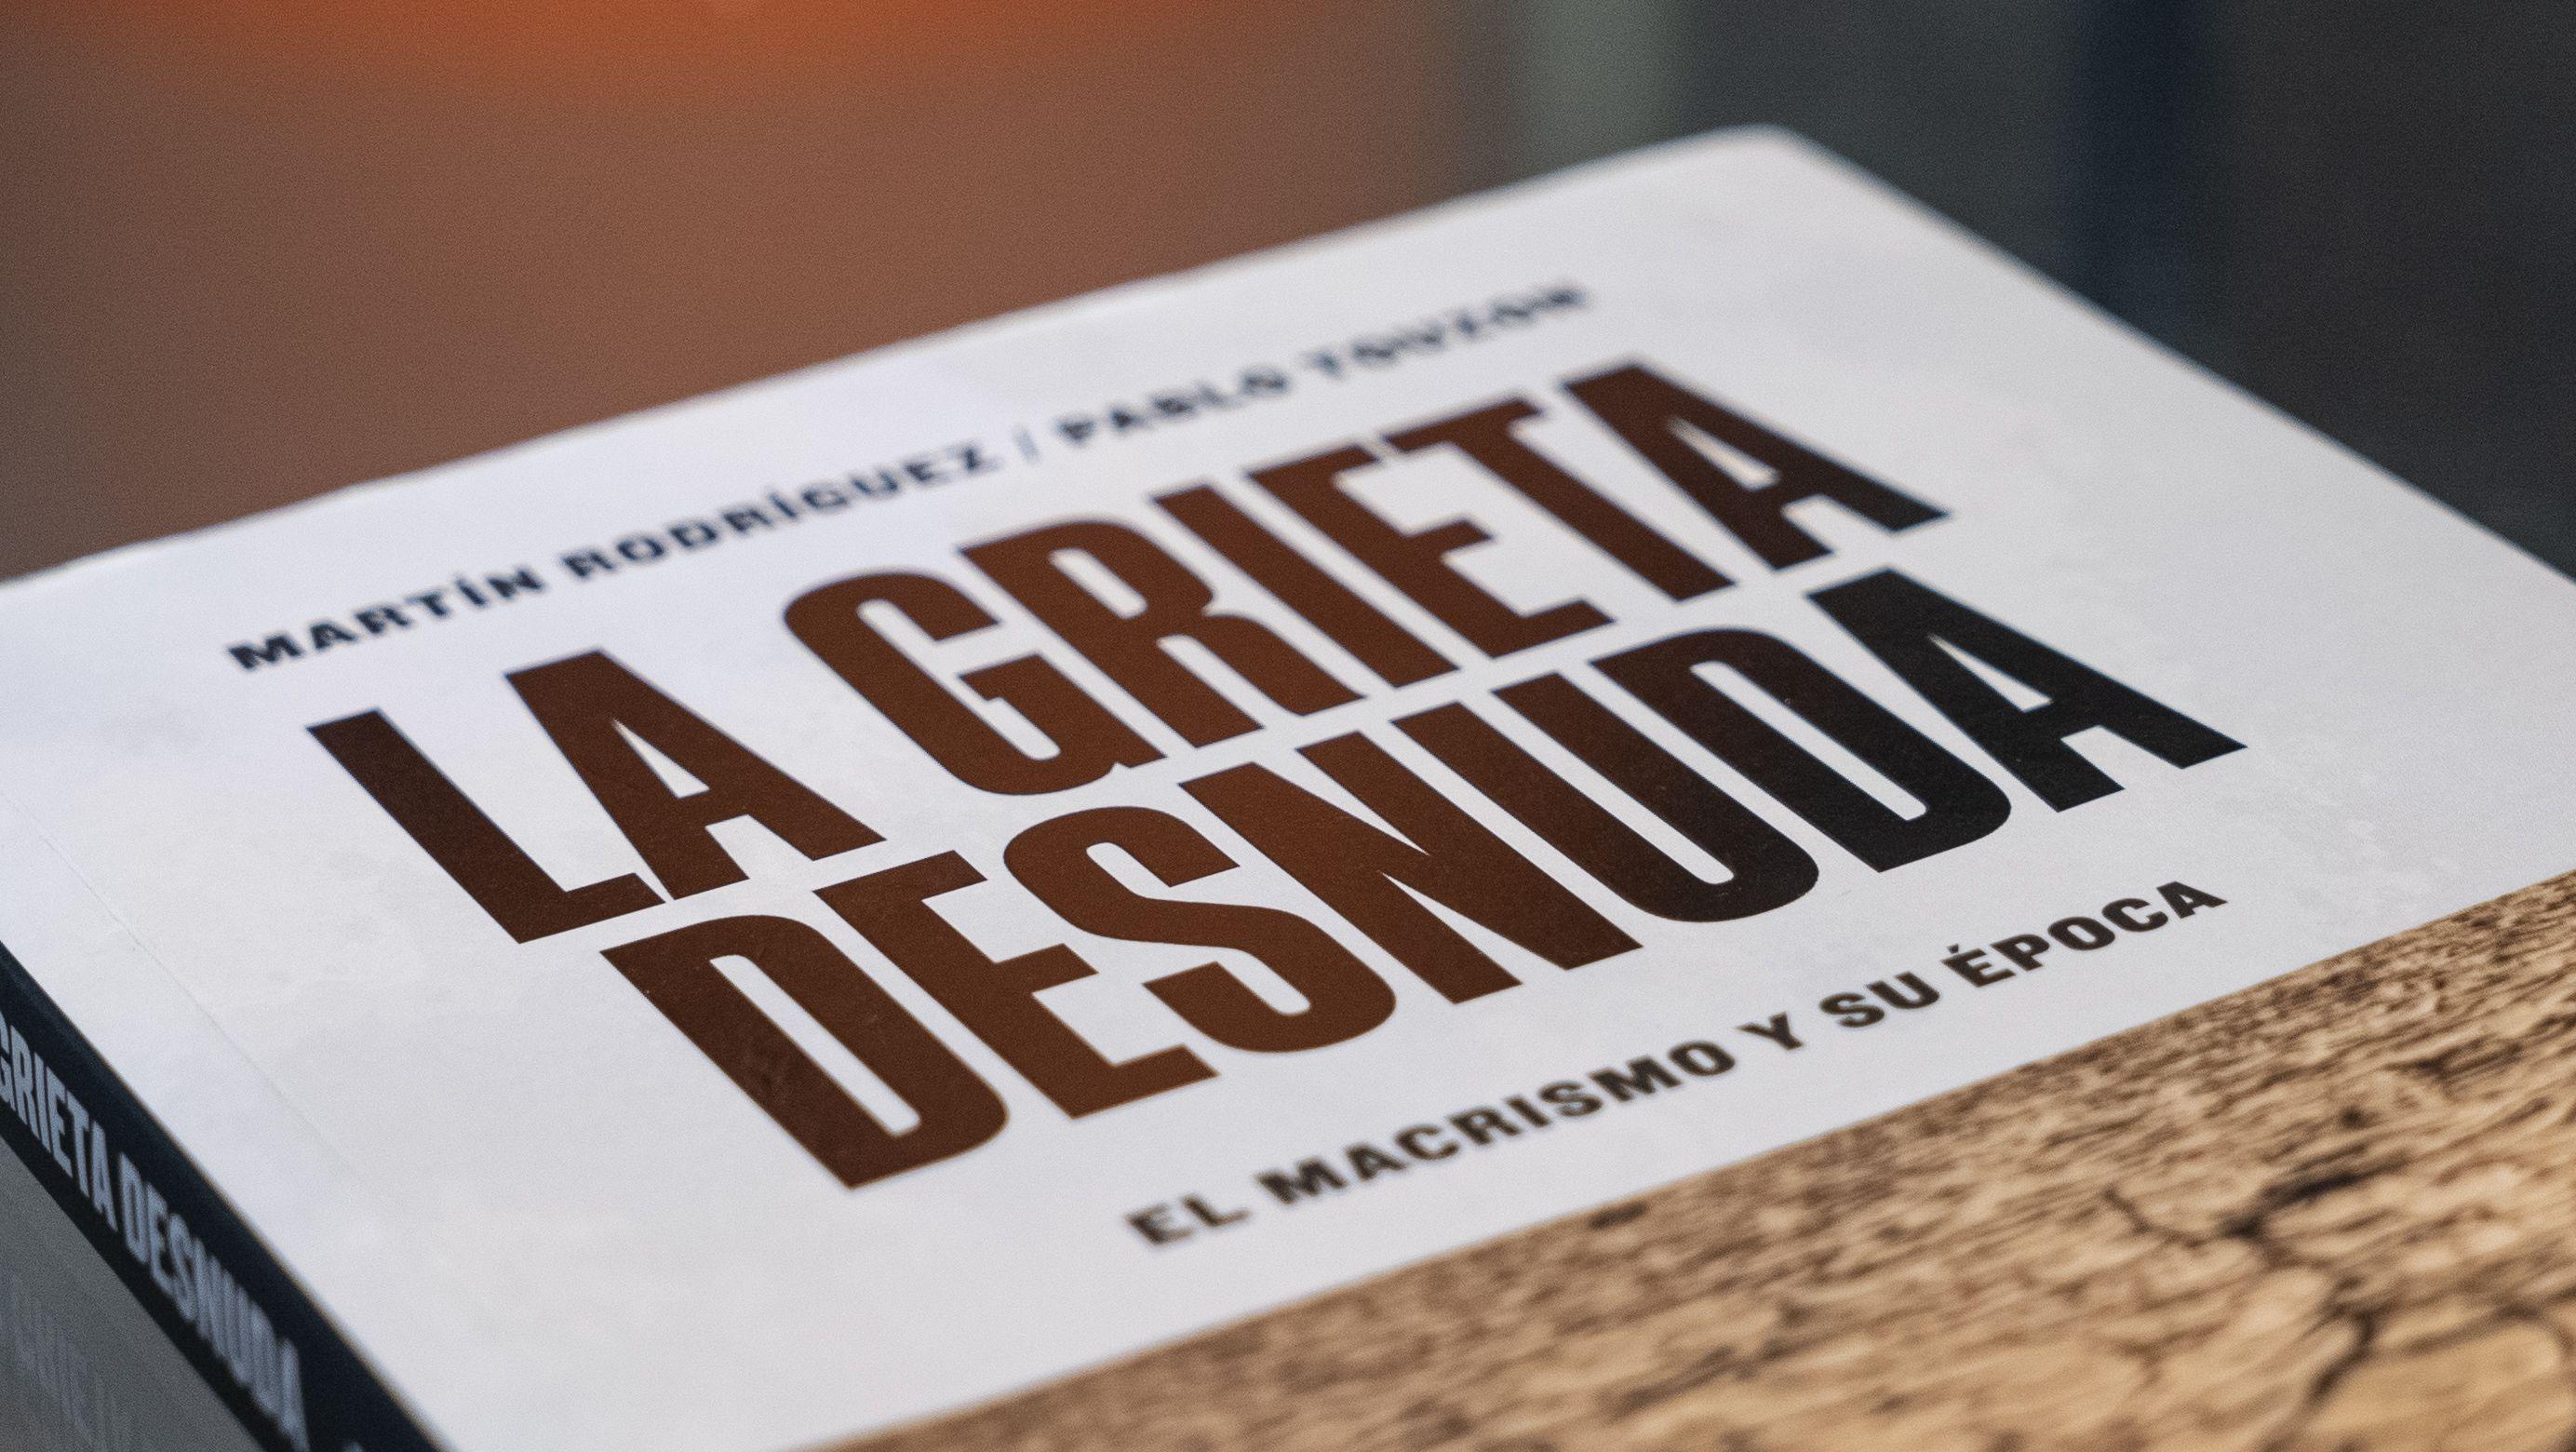 El libro que escribió junto a Pablo Touzon